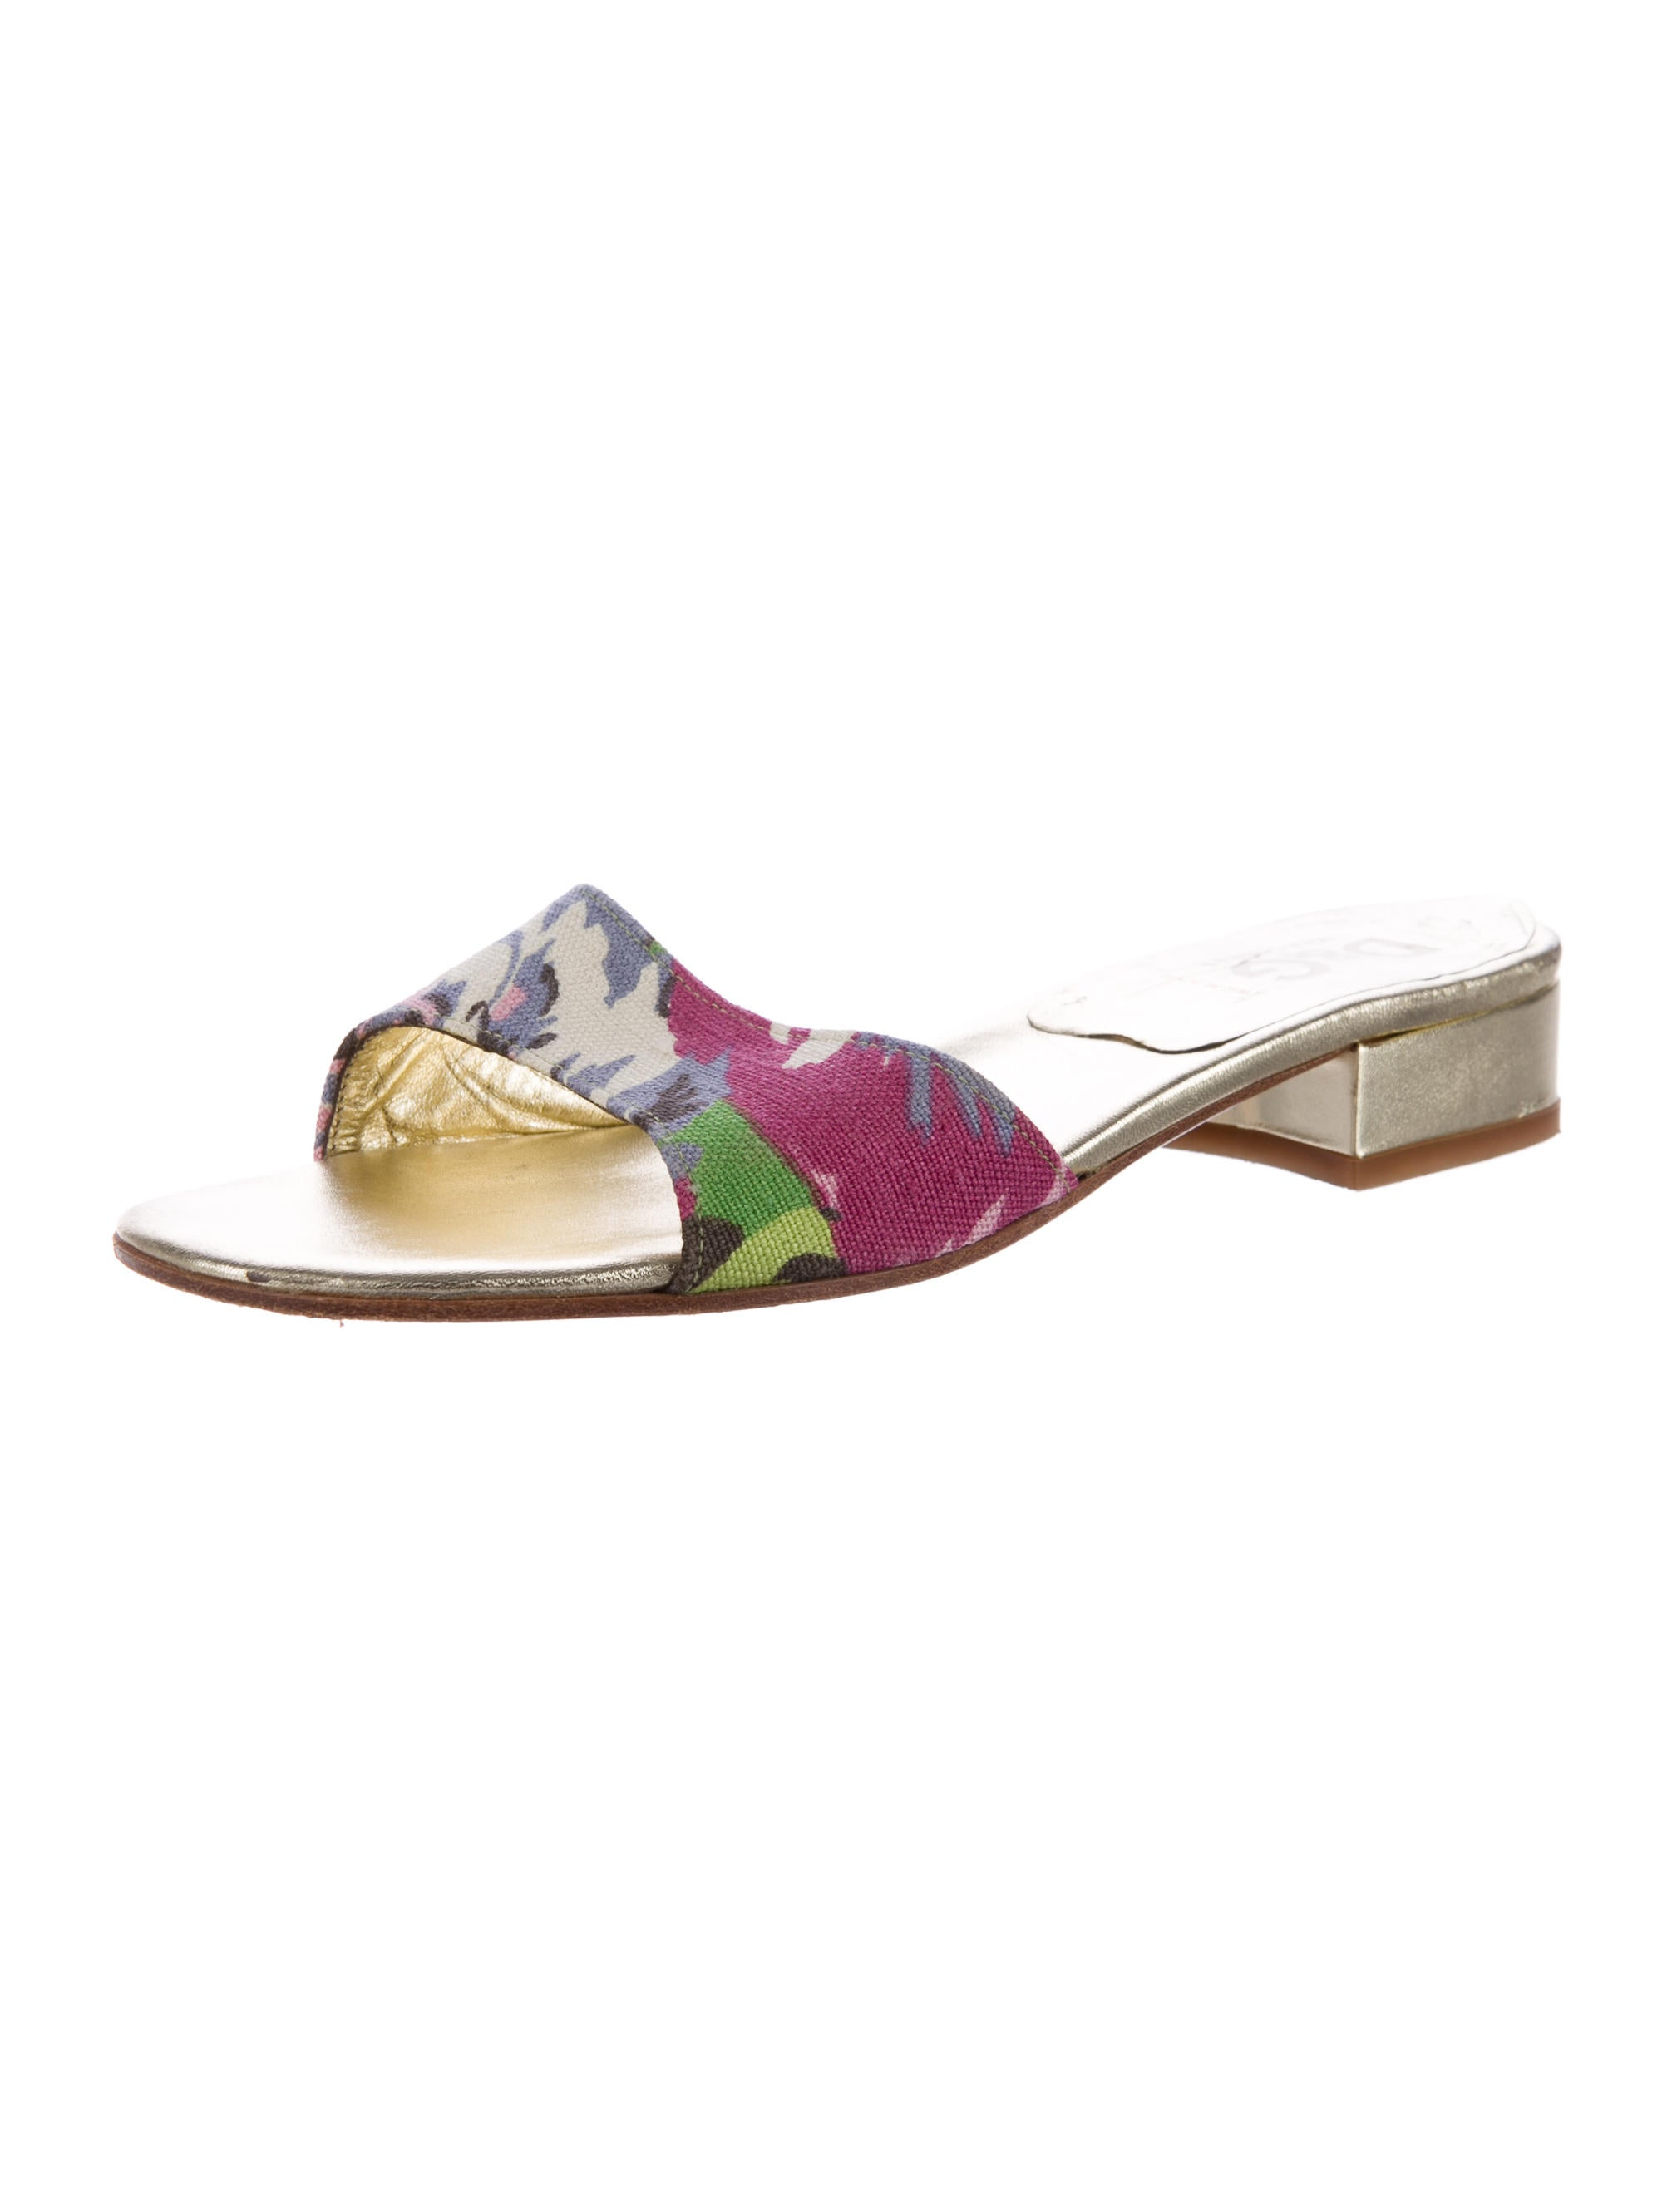 d g canvas slide sandals shoes wdg37207 the realreal